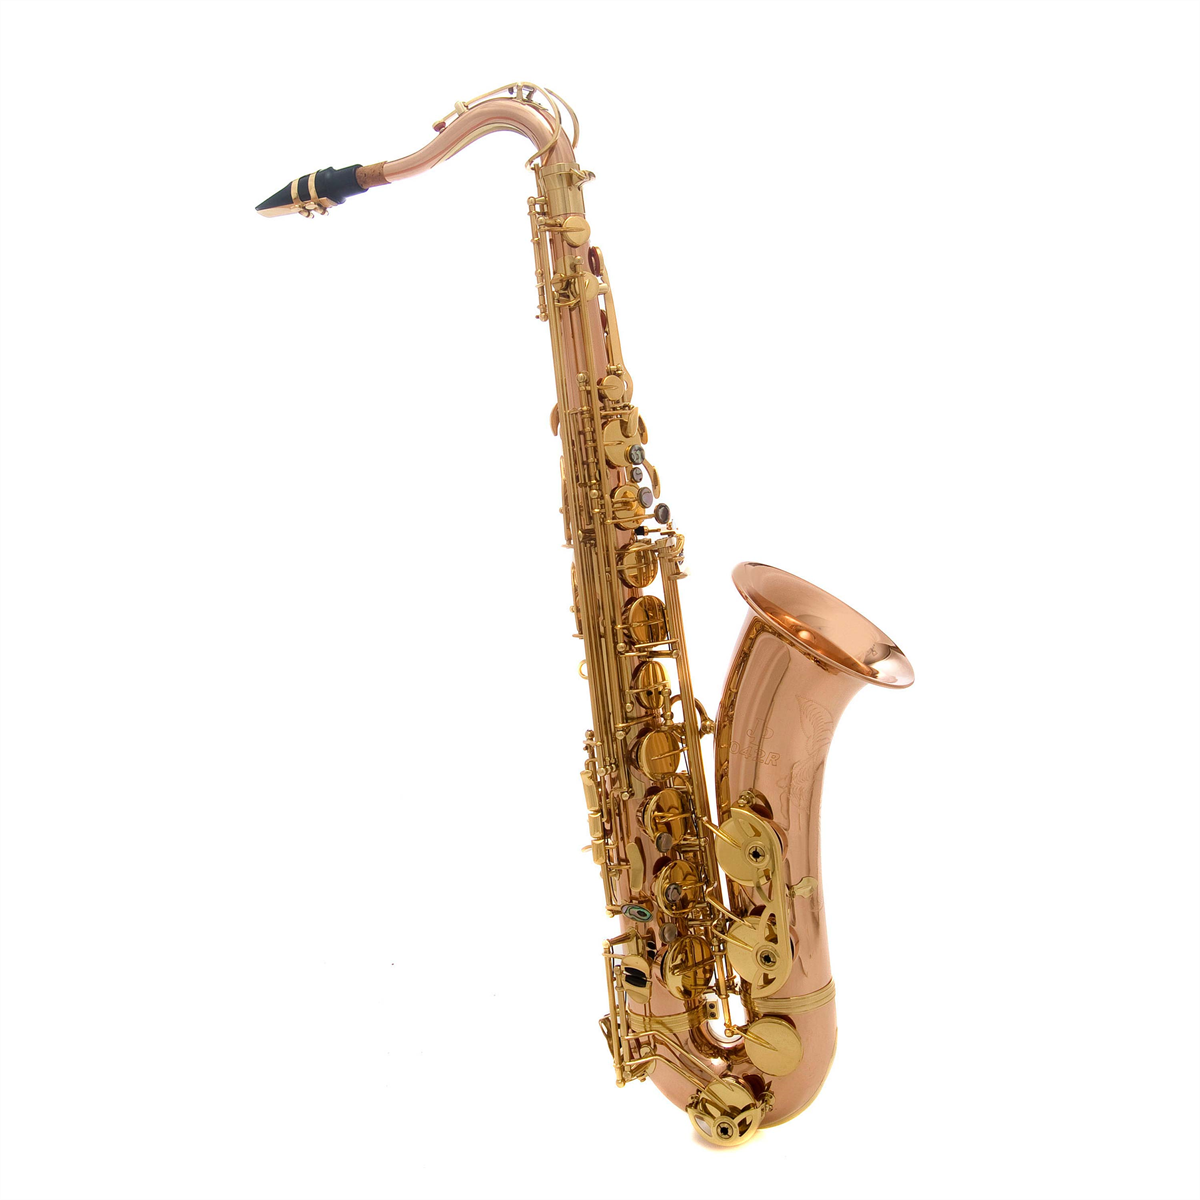 JP042R John Packer Saxophone Ténor - cuivre rosé